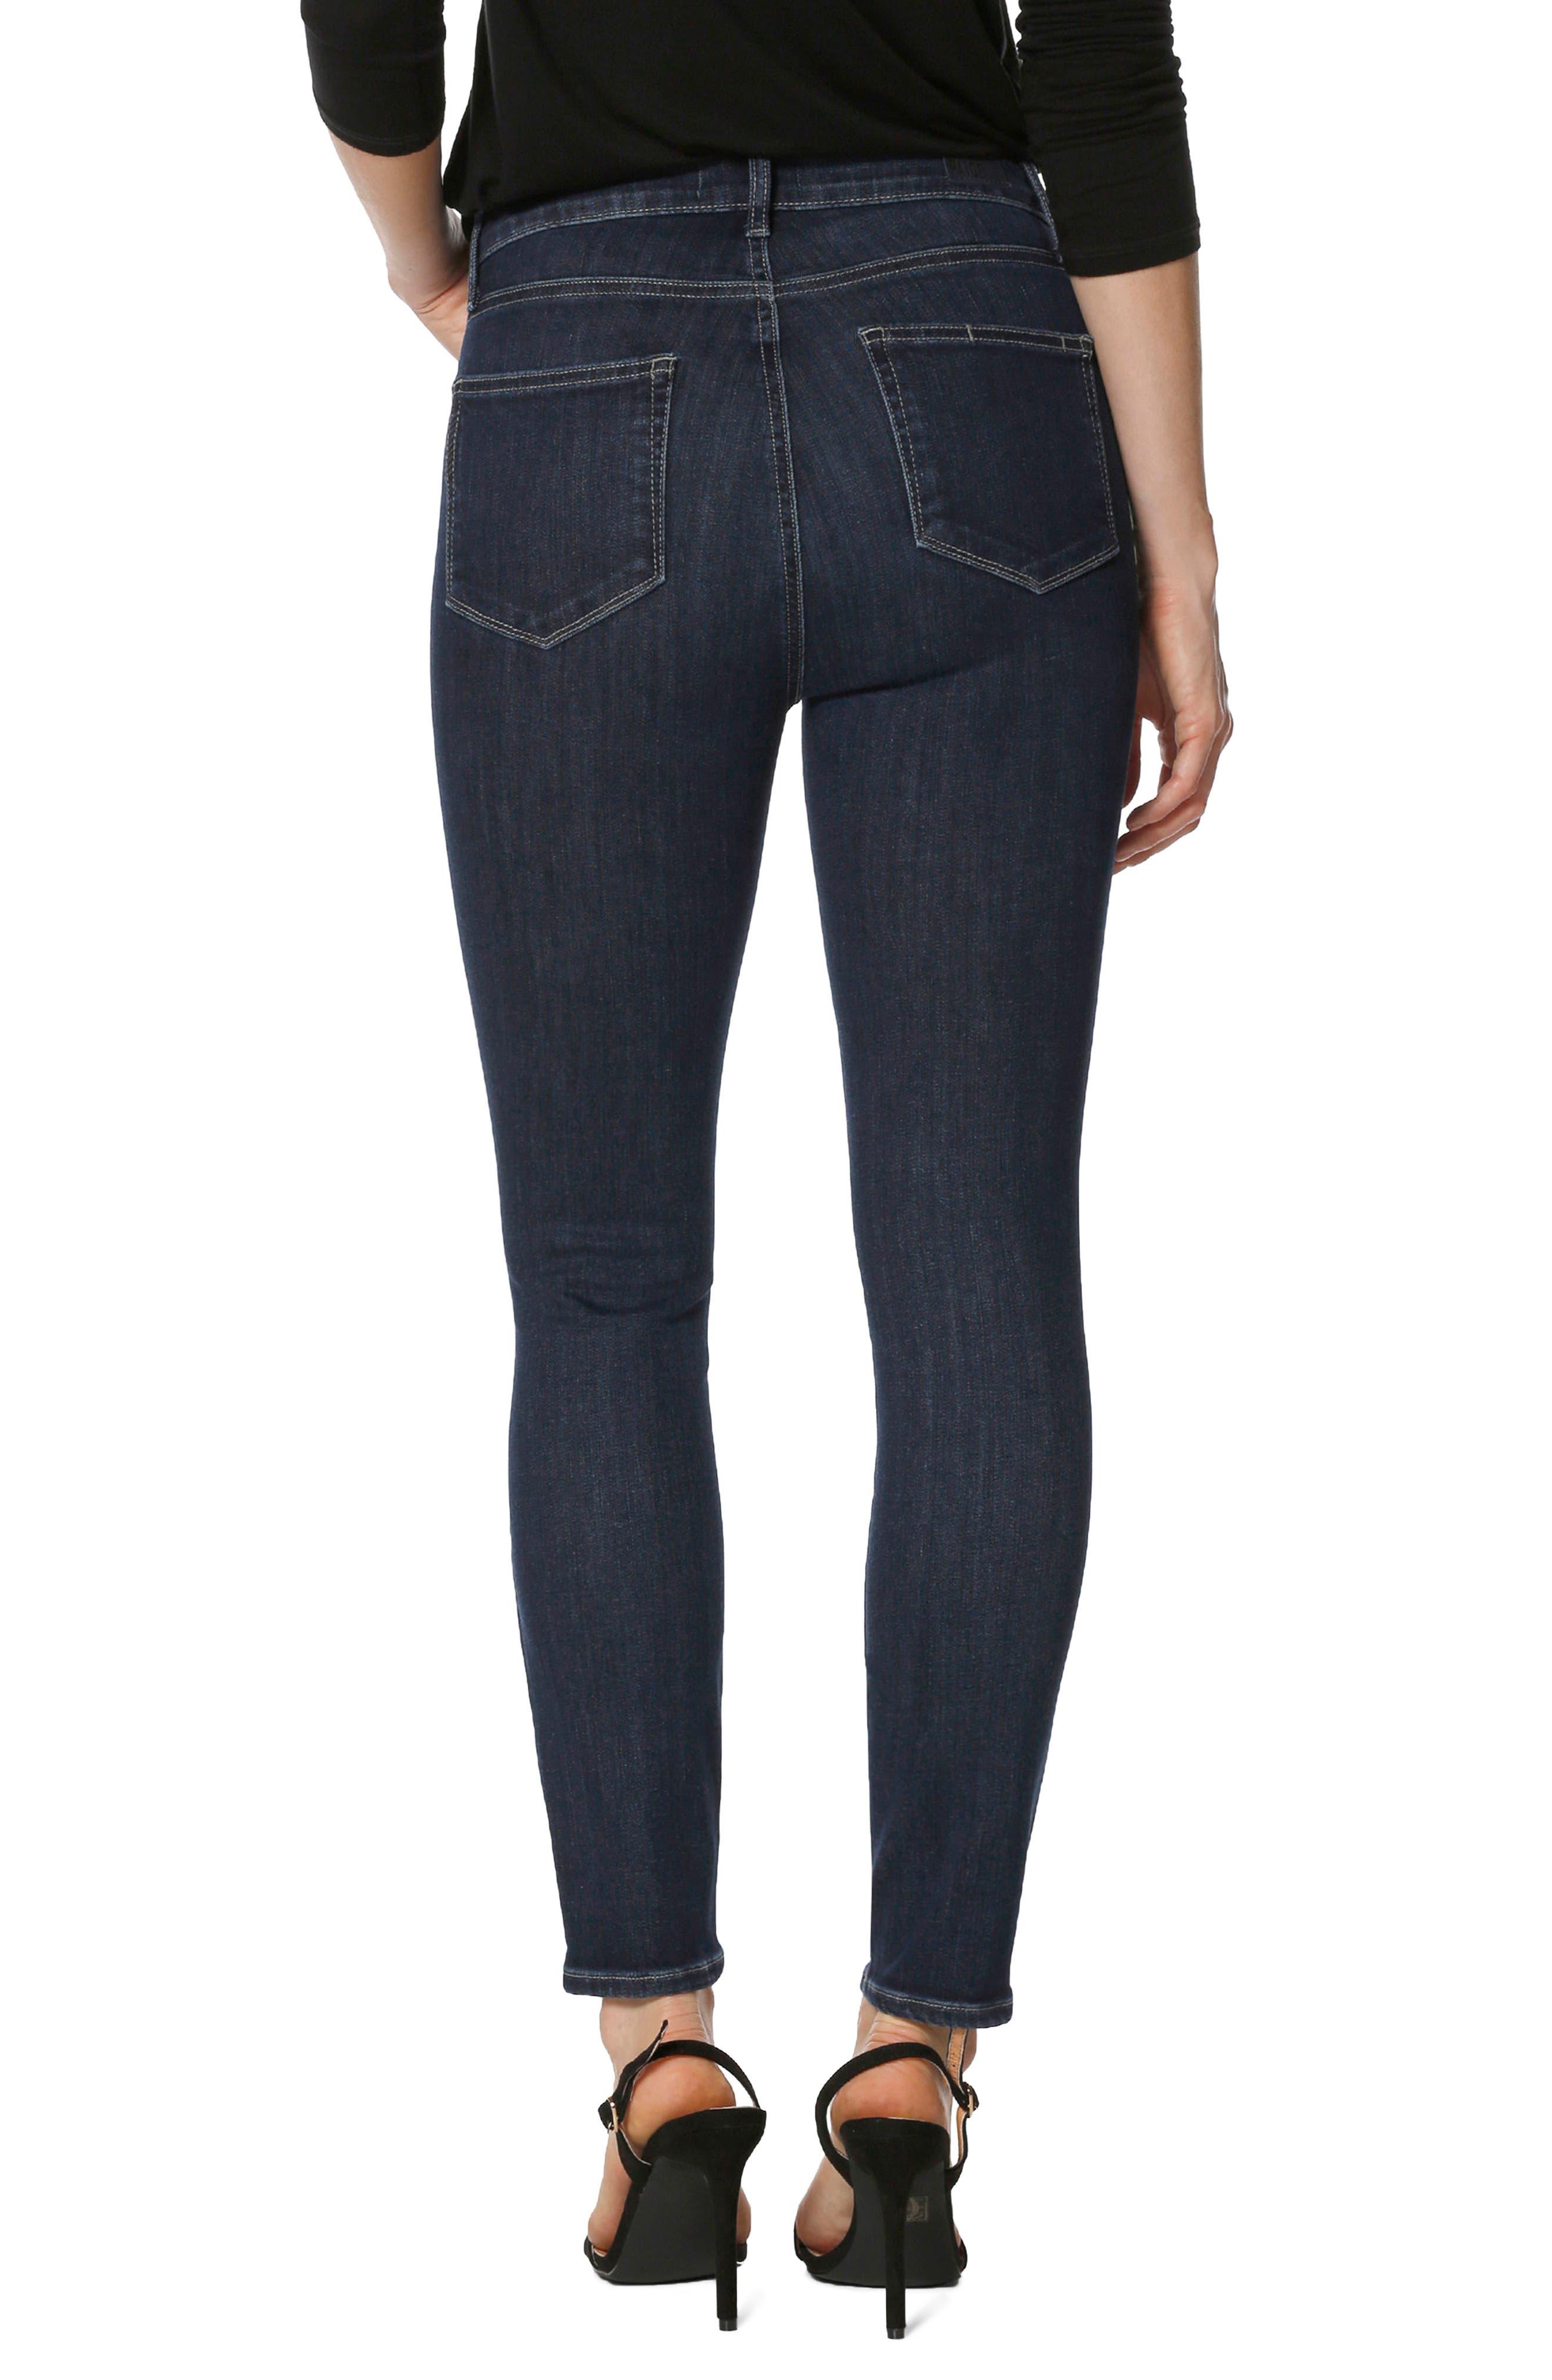 Transcend Vintage - Margot High Waist Ankle Ultra Skinny Jeans,                             Alternate thumbnail 2, color,